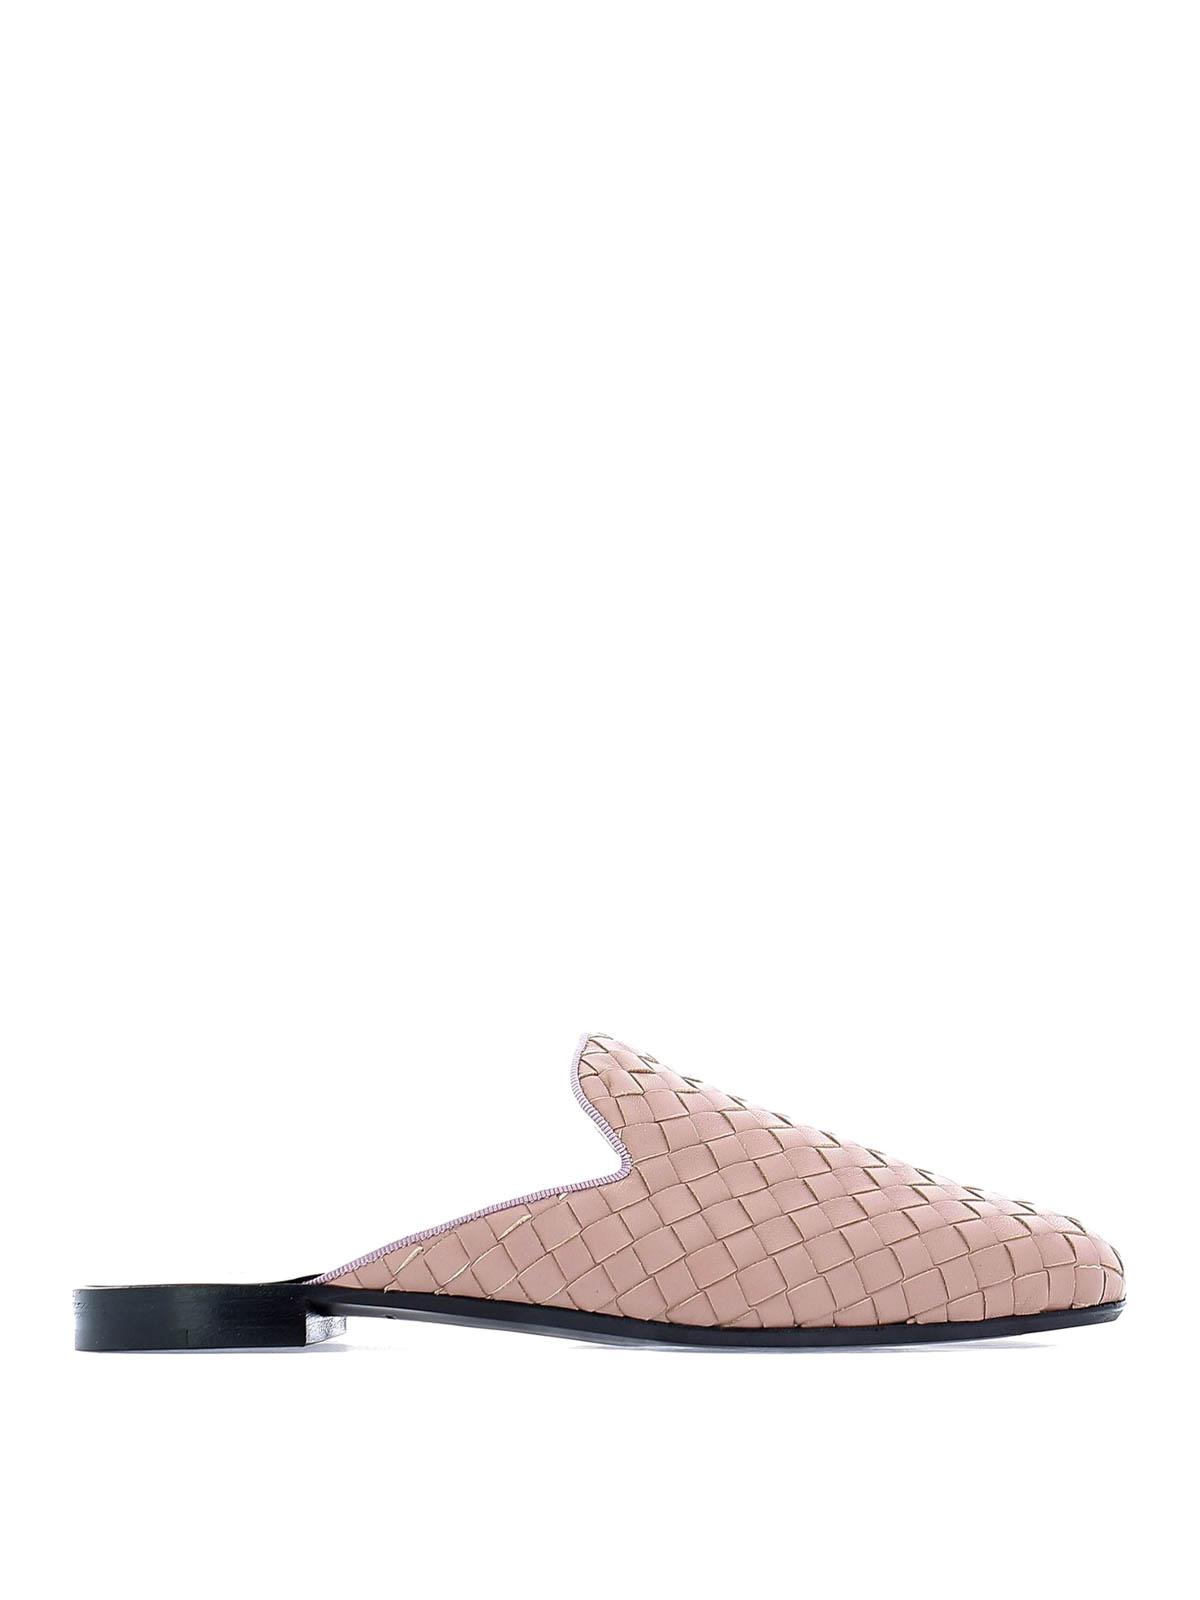 54a91fe07cc BOTTEGA VENETA  Loafers   Slippers - Fiandra Intrecciato nappa slippers